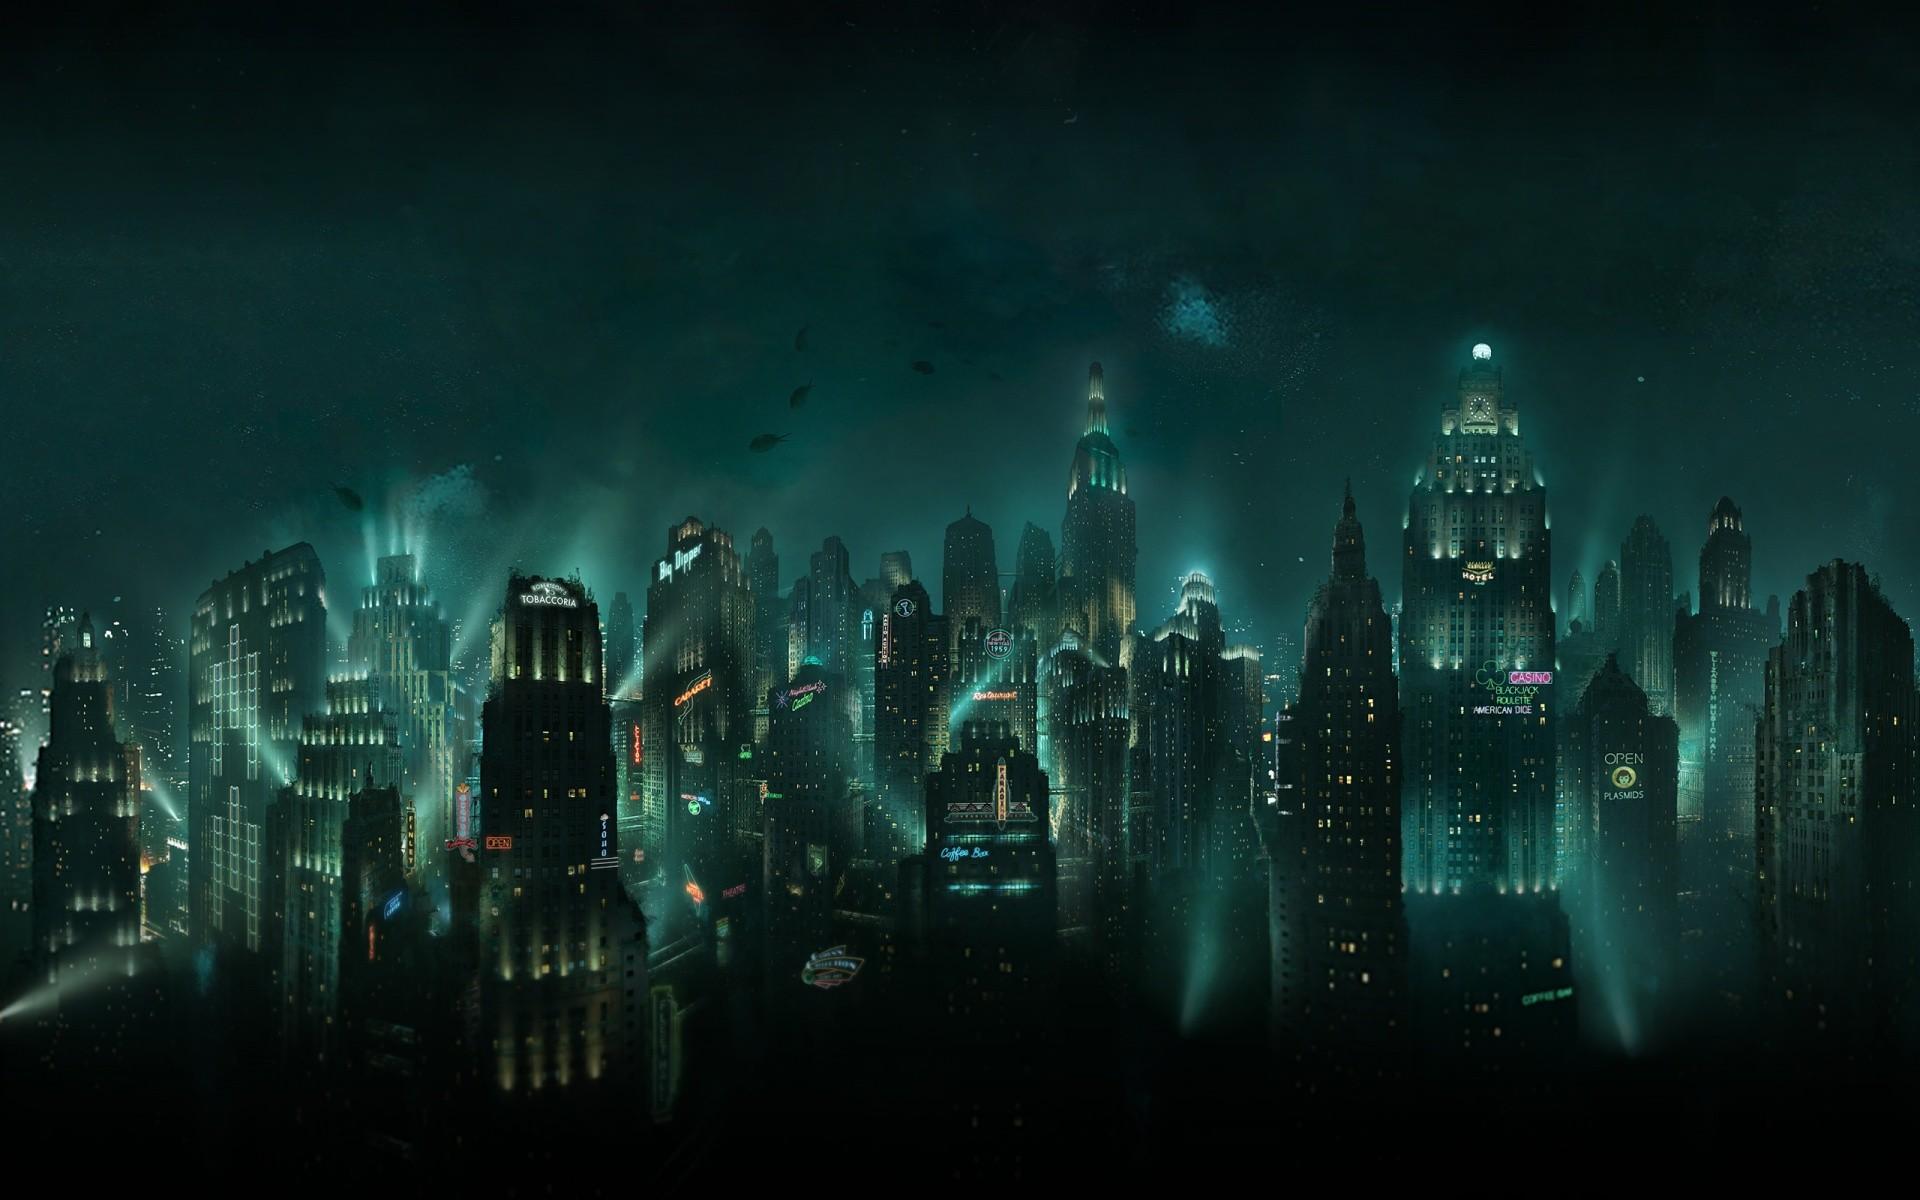 Bioshock Rapture HD Desktop Wallpaper